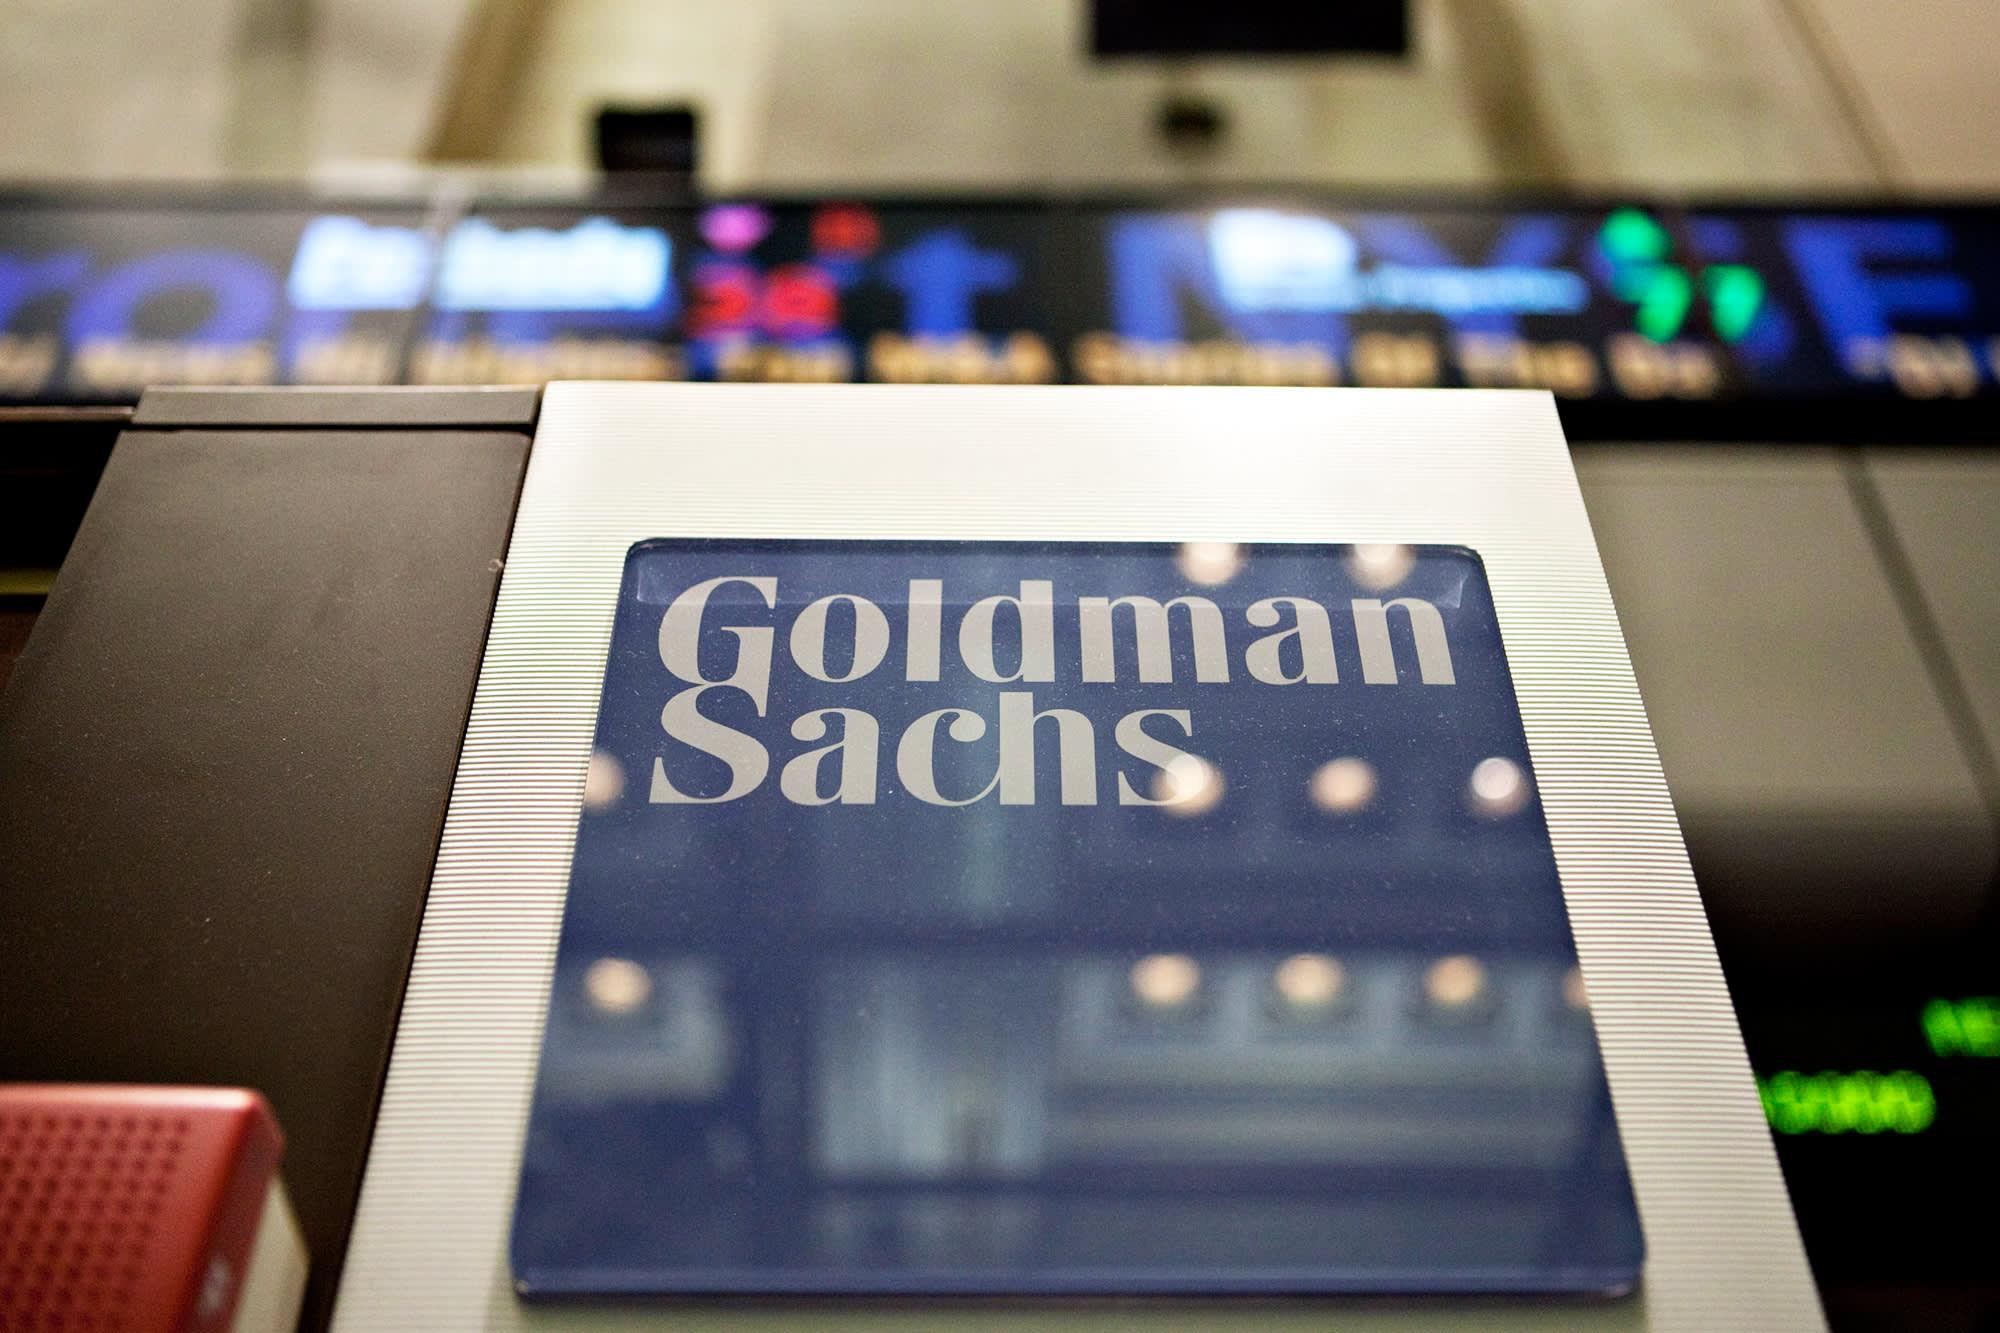 prekyba bitcoin goldman sachs